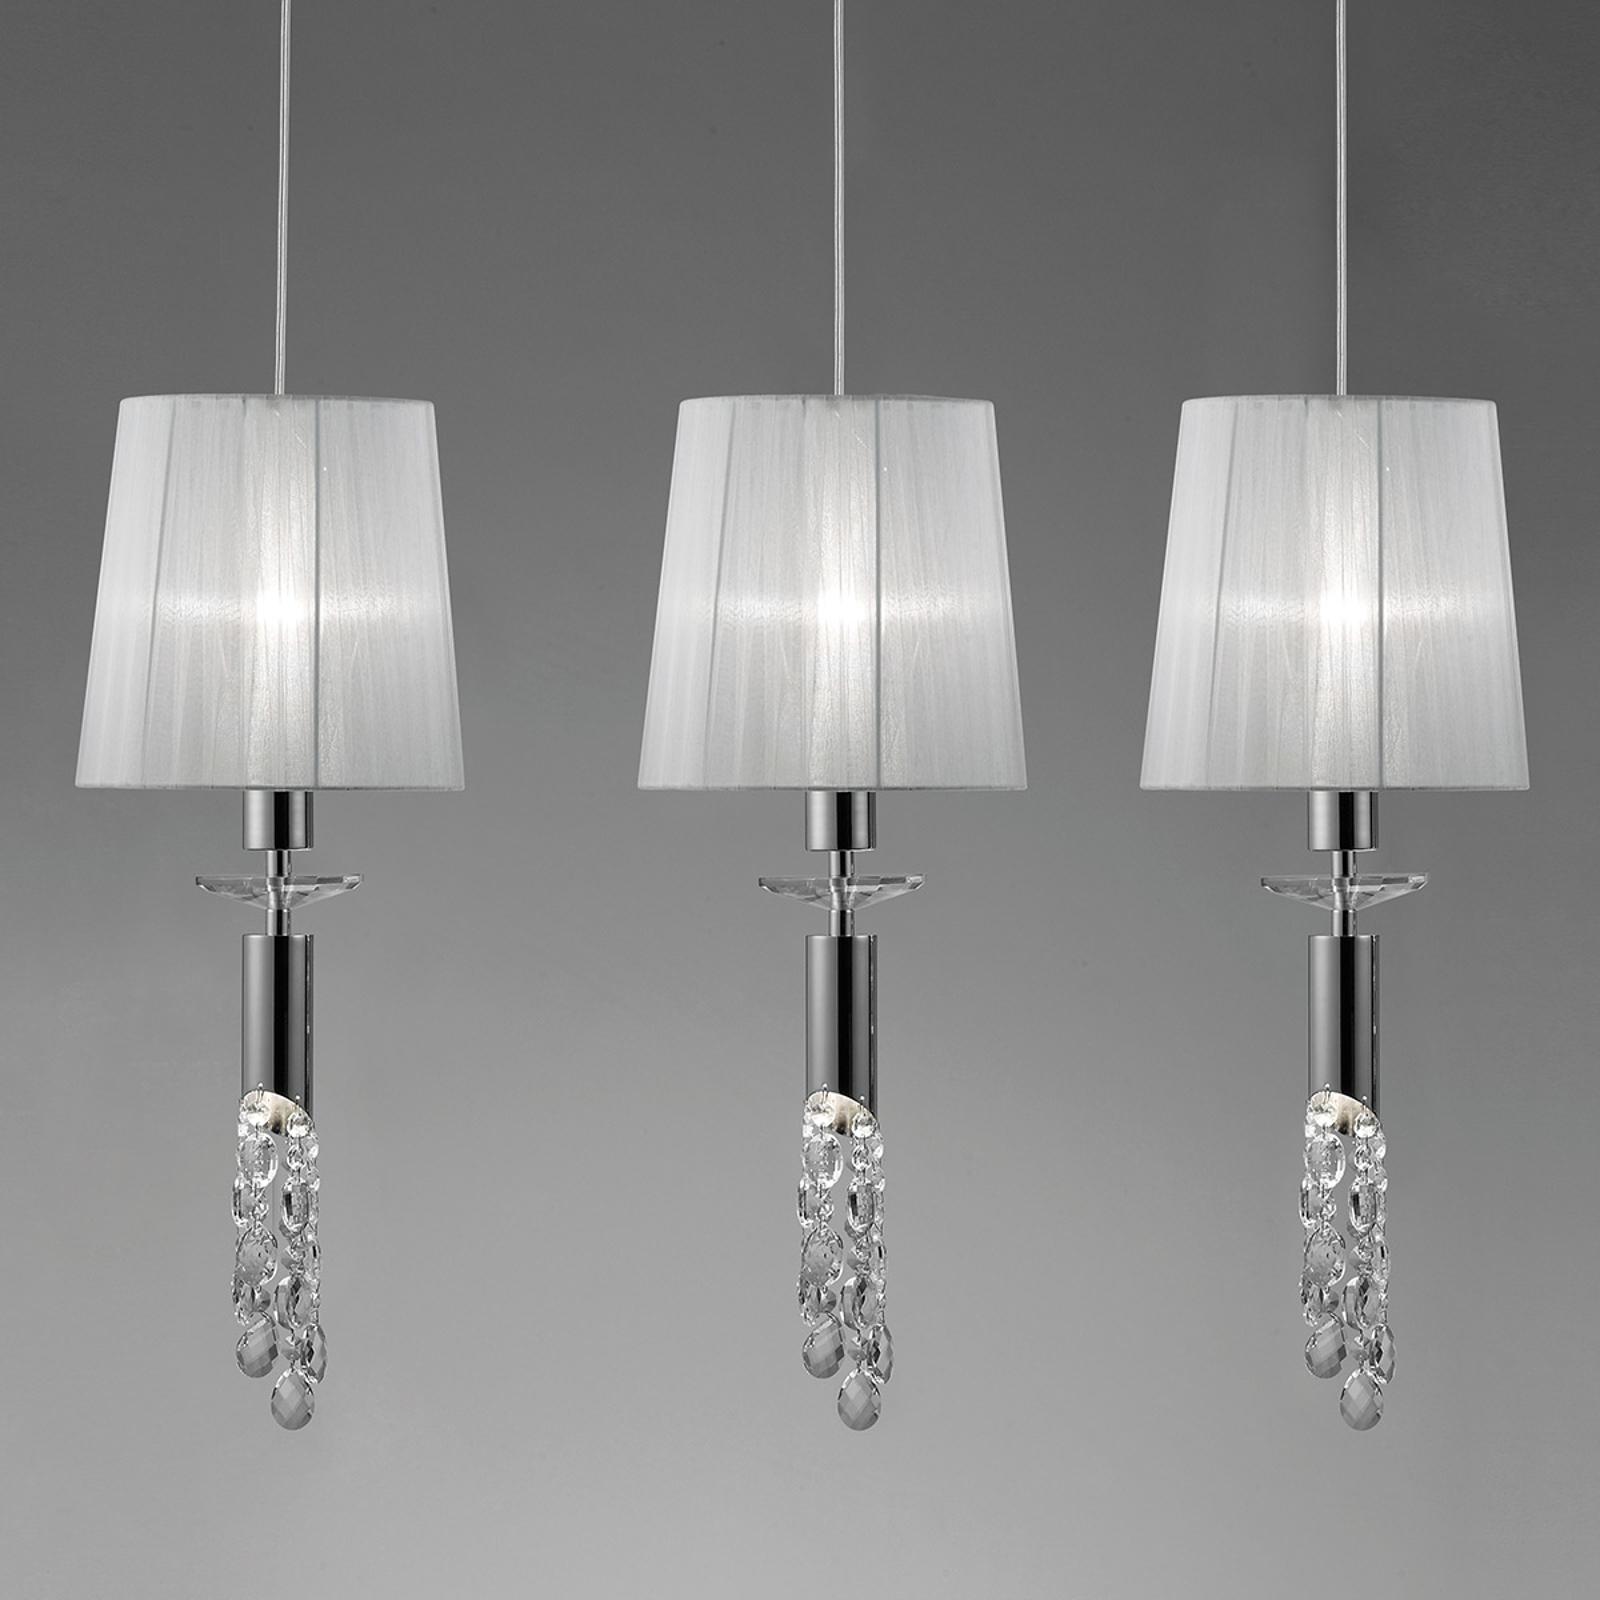 Hanglamp Lilja 3-lamps